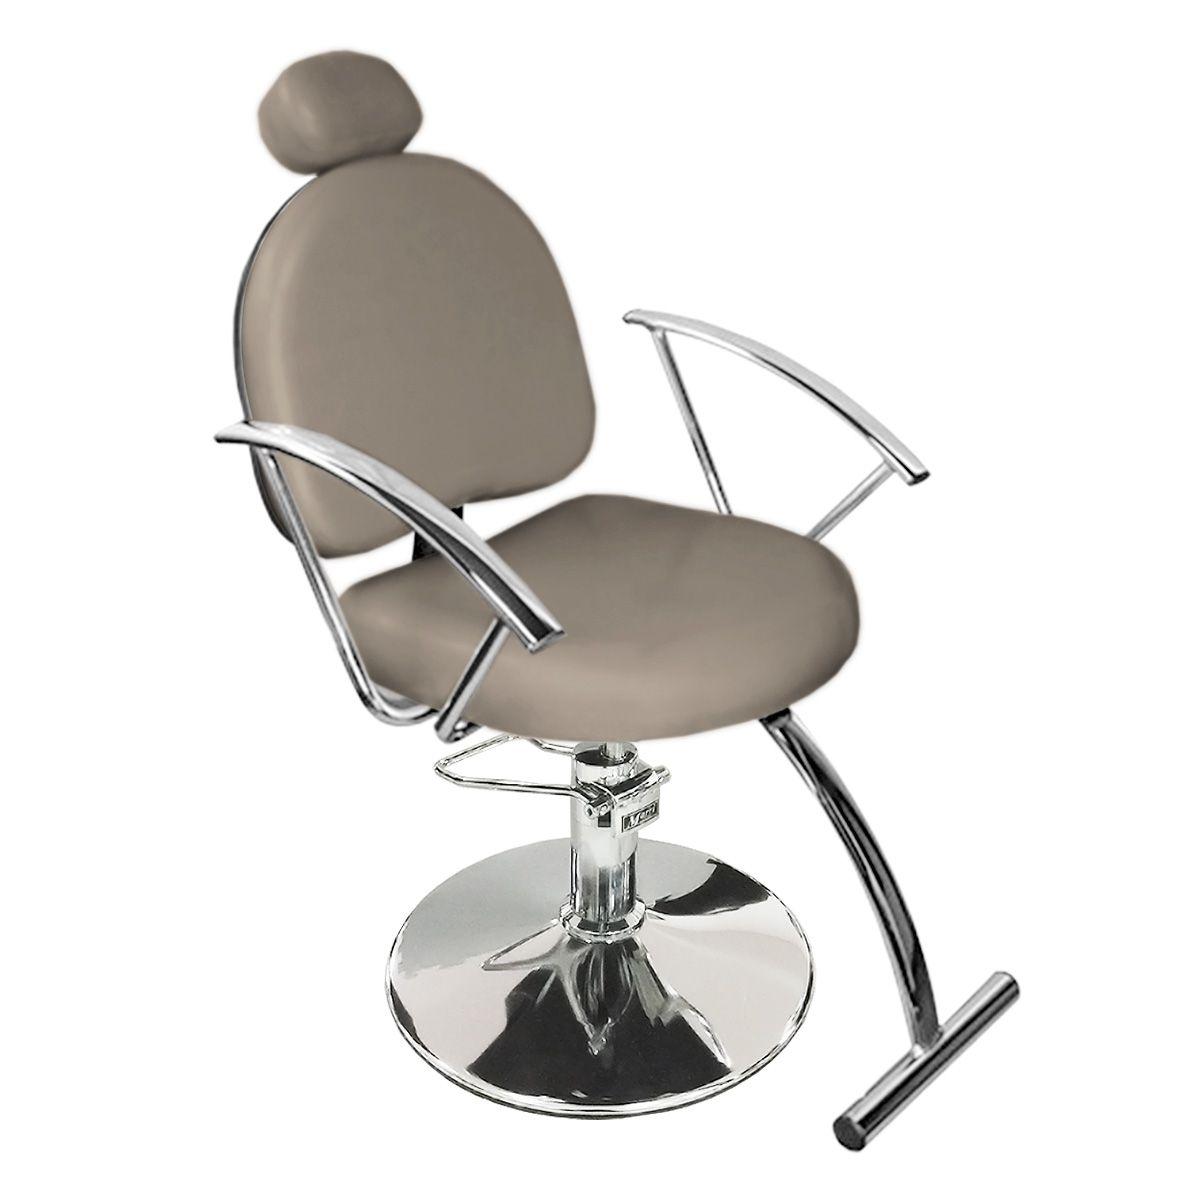 Cadeira de Cabeleireiro Roma Encosto fixo - Pé Redondo